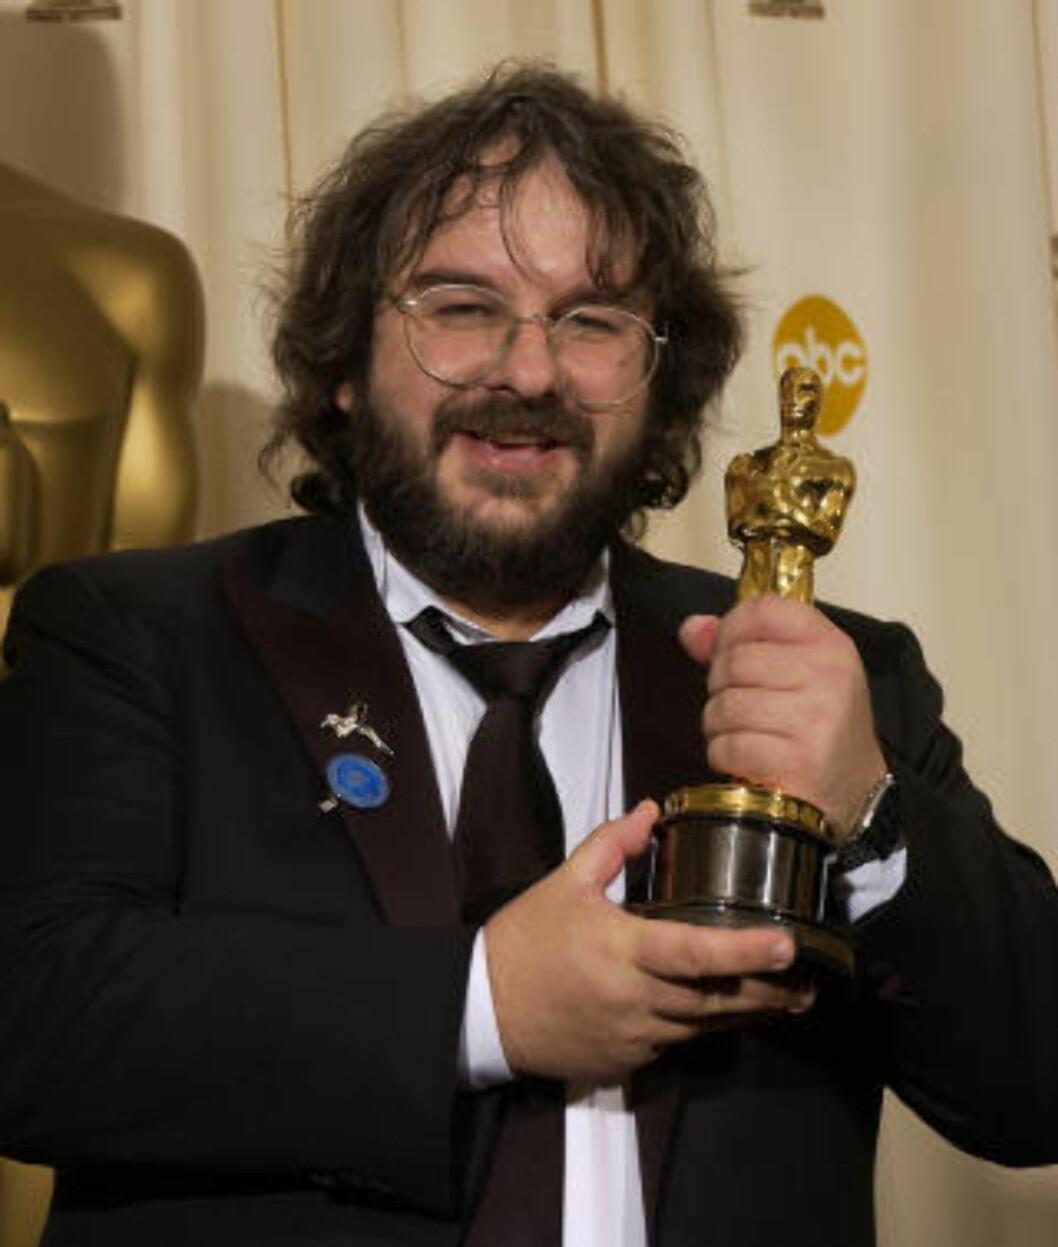 <strong>NY TRILOGI:</strong> Peter Jackson har tidligere regissert «Ringenes herre»-trilogien. Nå har han tatt fatt på en ny filmtrilogi basert på forfatter J.R.R. Tolkiens univers: «Hobbiten». Foto: AP Photo / Reed Saxon / NTB scanpix